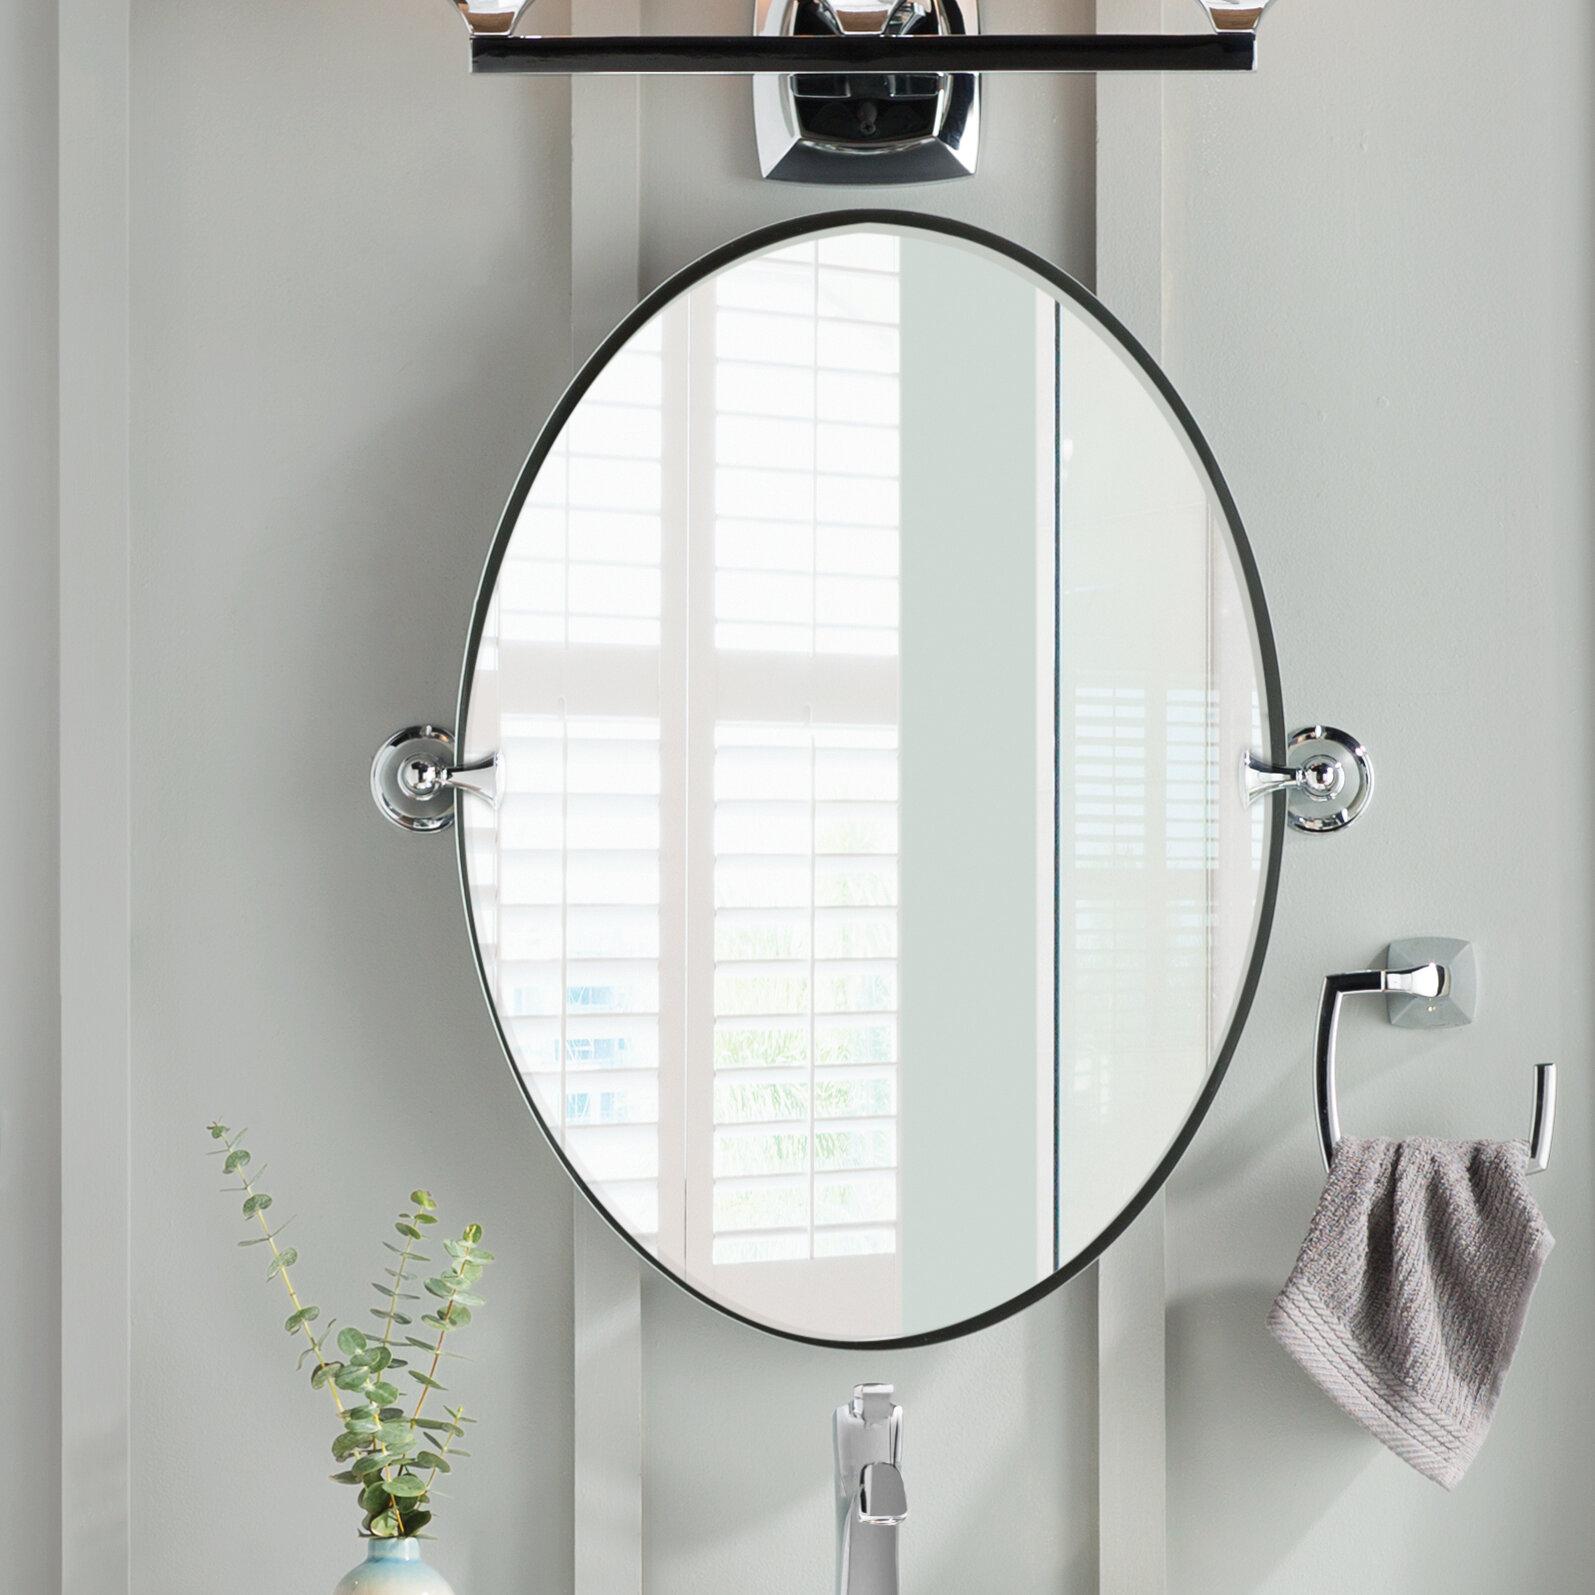 Oval Frameless Bathroom Mirror Beveled Mirror Vanity Mirror Makeup Mirrors Decorative Mirror For Bedroom Living Room Hallway Home Mirrors